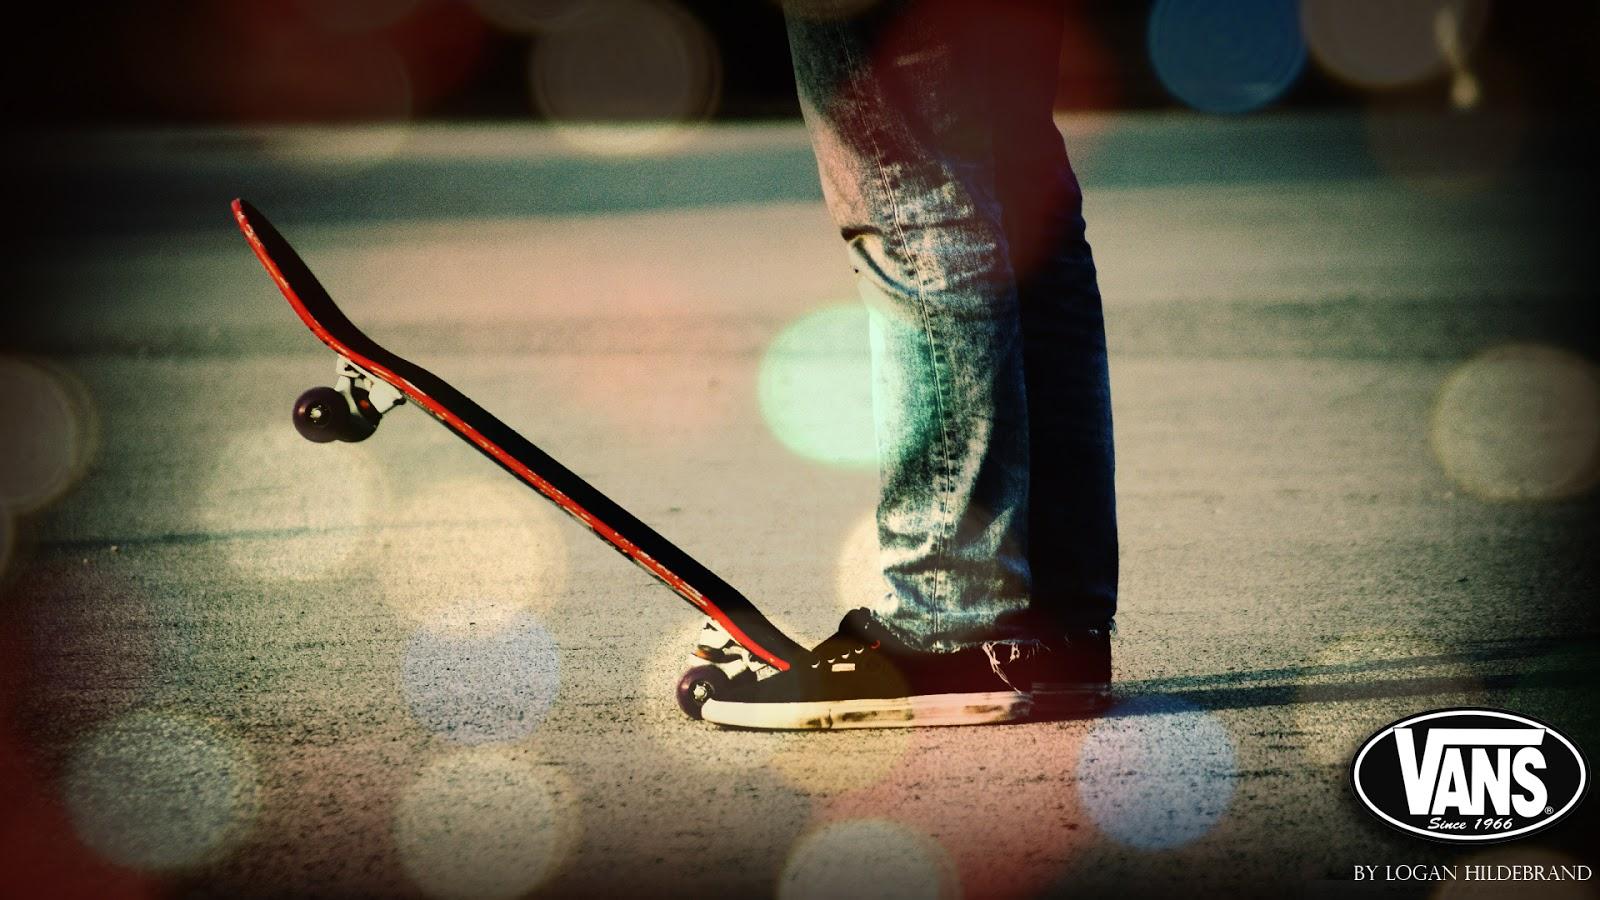 vans skate boarding escape and go create